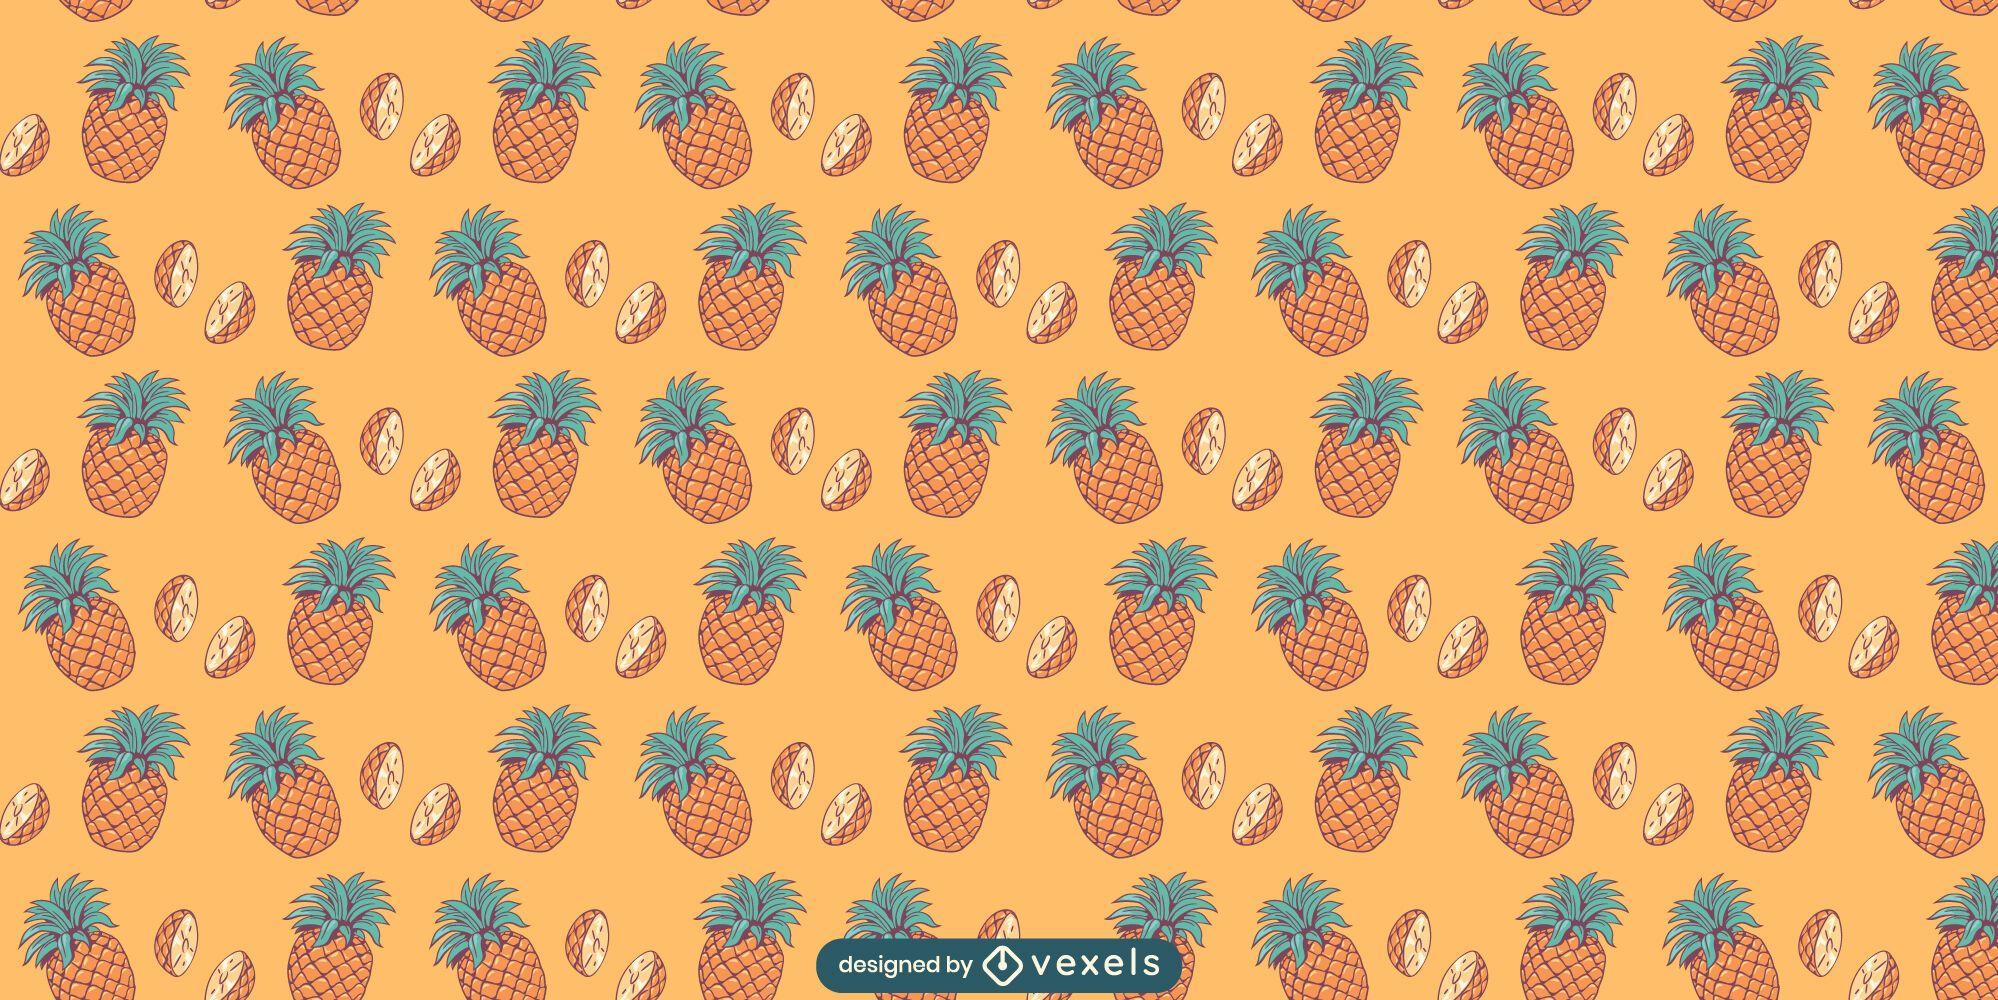 Pineapple fruit pattern design